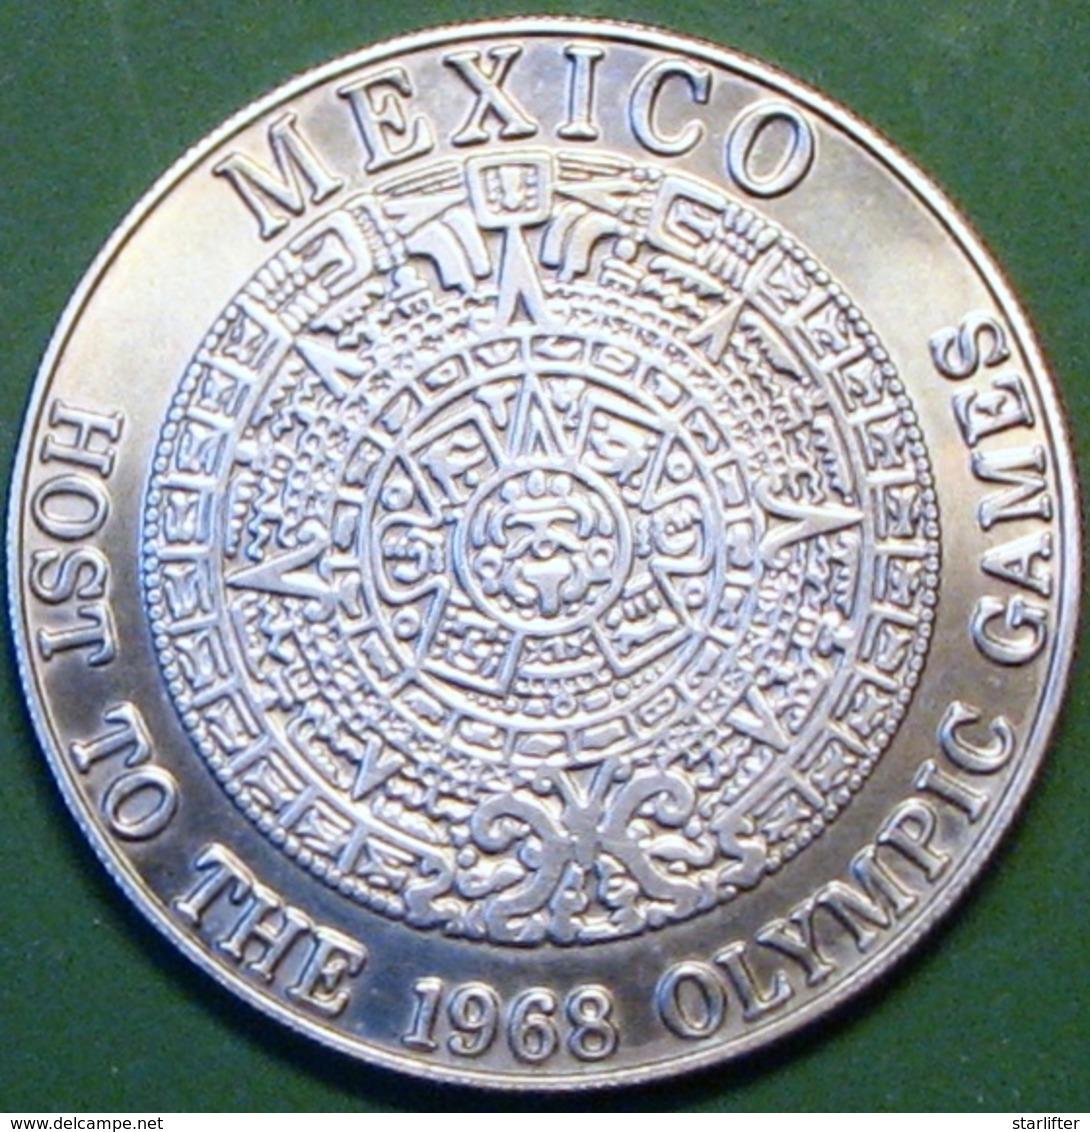 $1 Casino Token. Caliente, Tijuana, Mexico. 1966 NEW. D09. - Casino